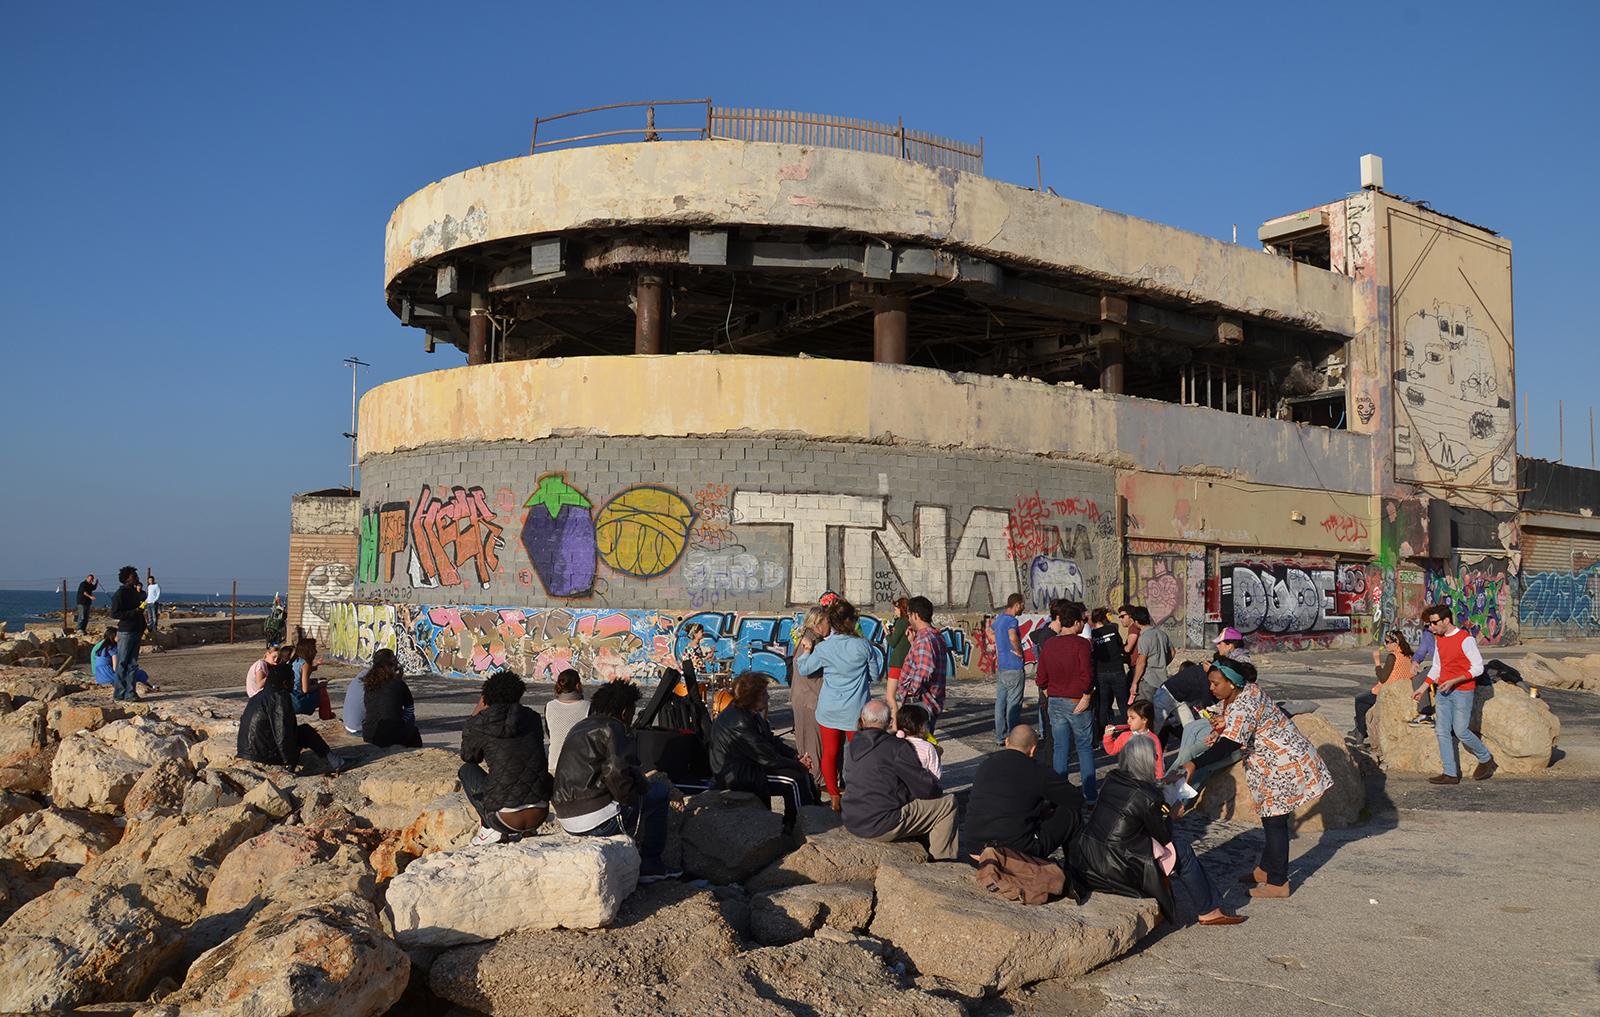 Delfinárium, diskotéka, která byla 2x terčem teroristických útoků, Tel-Aviv, Izrael